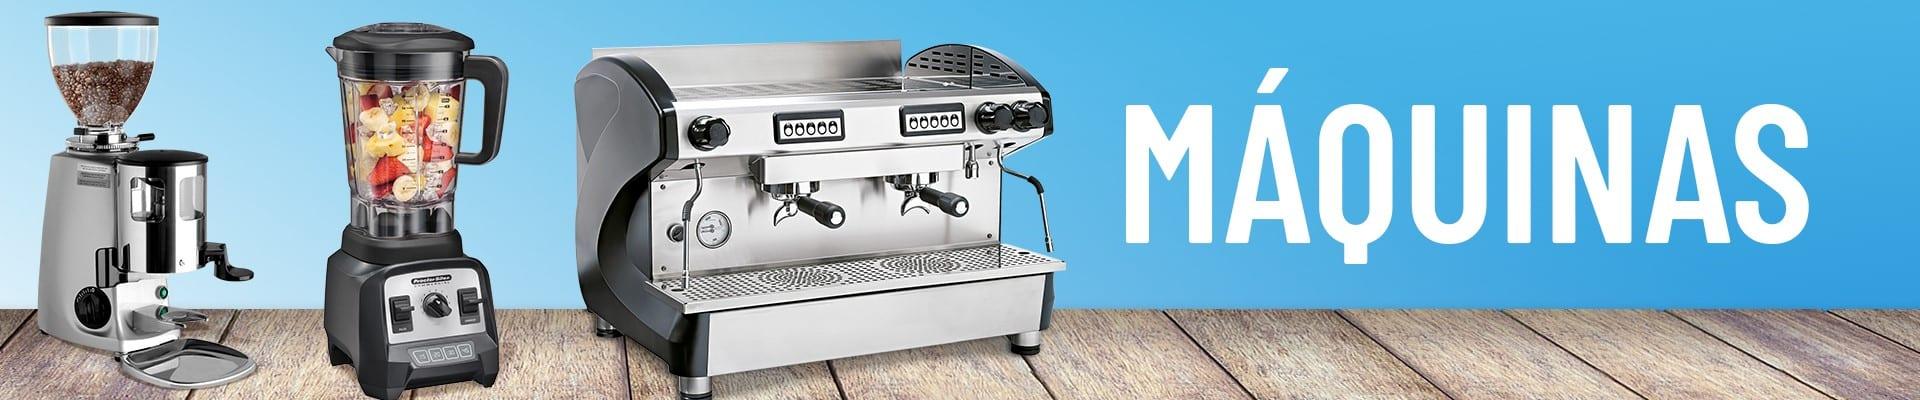 Máquinas para cafeterías